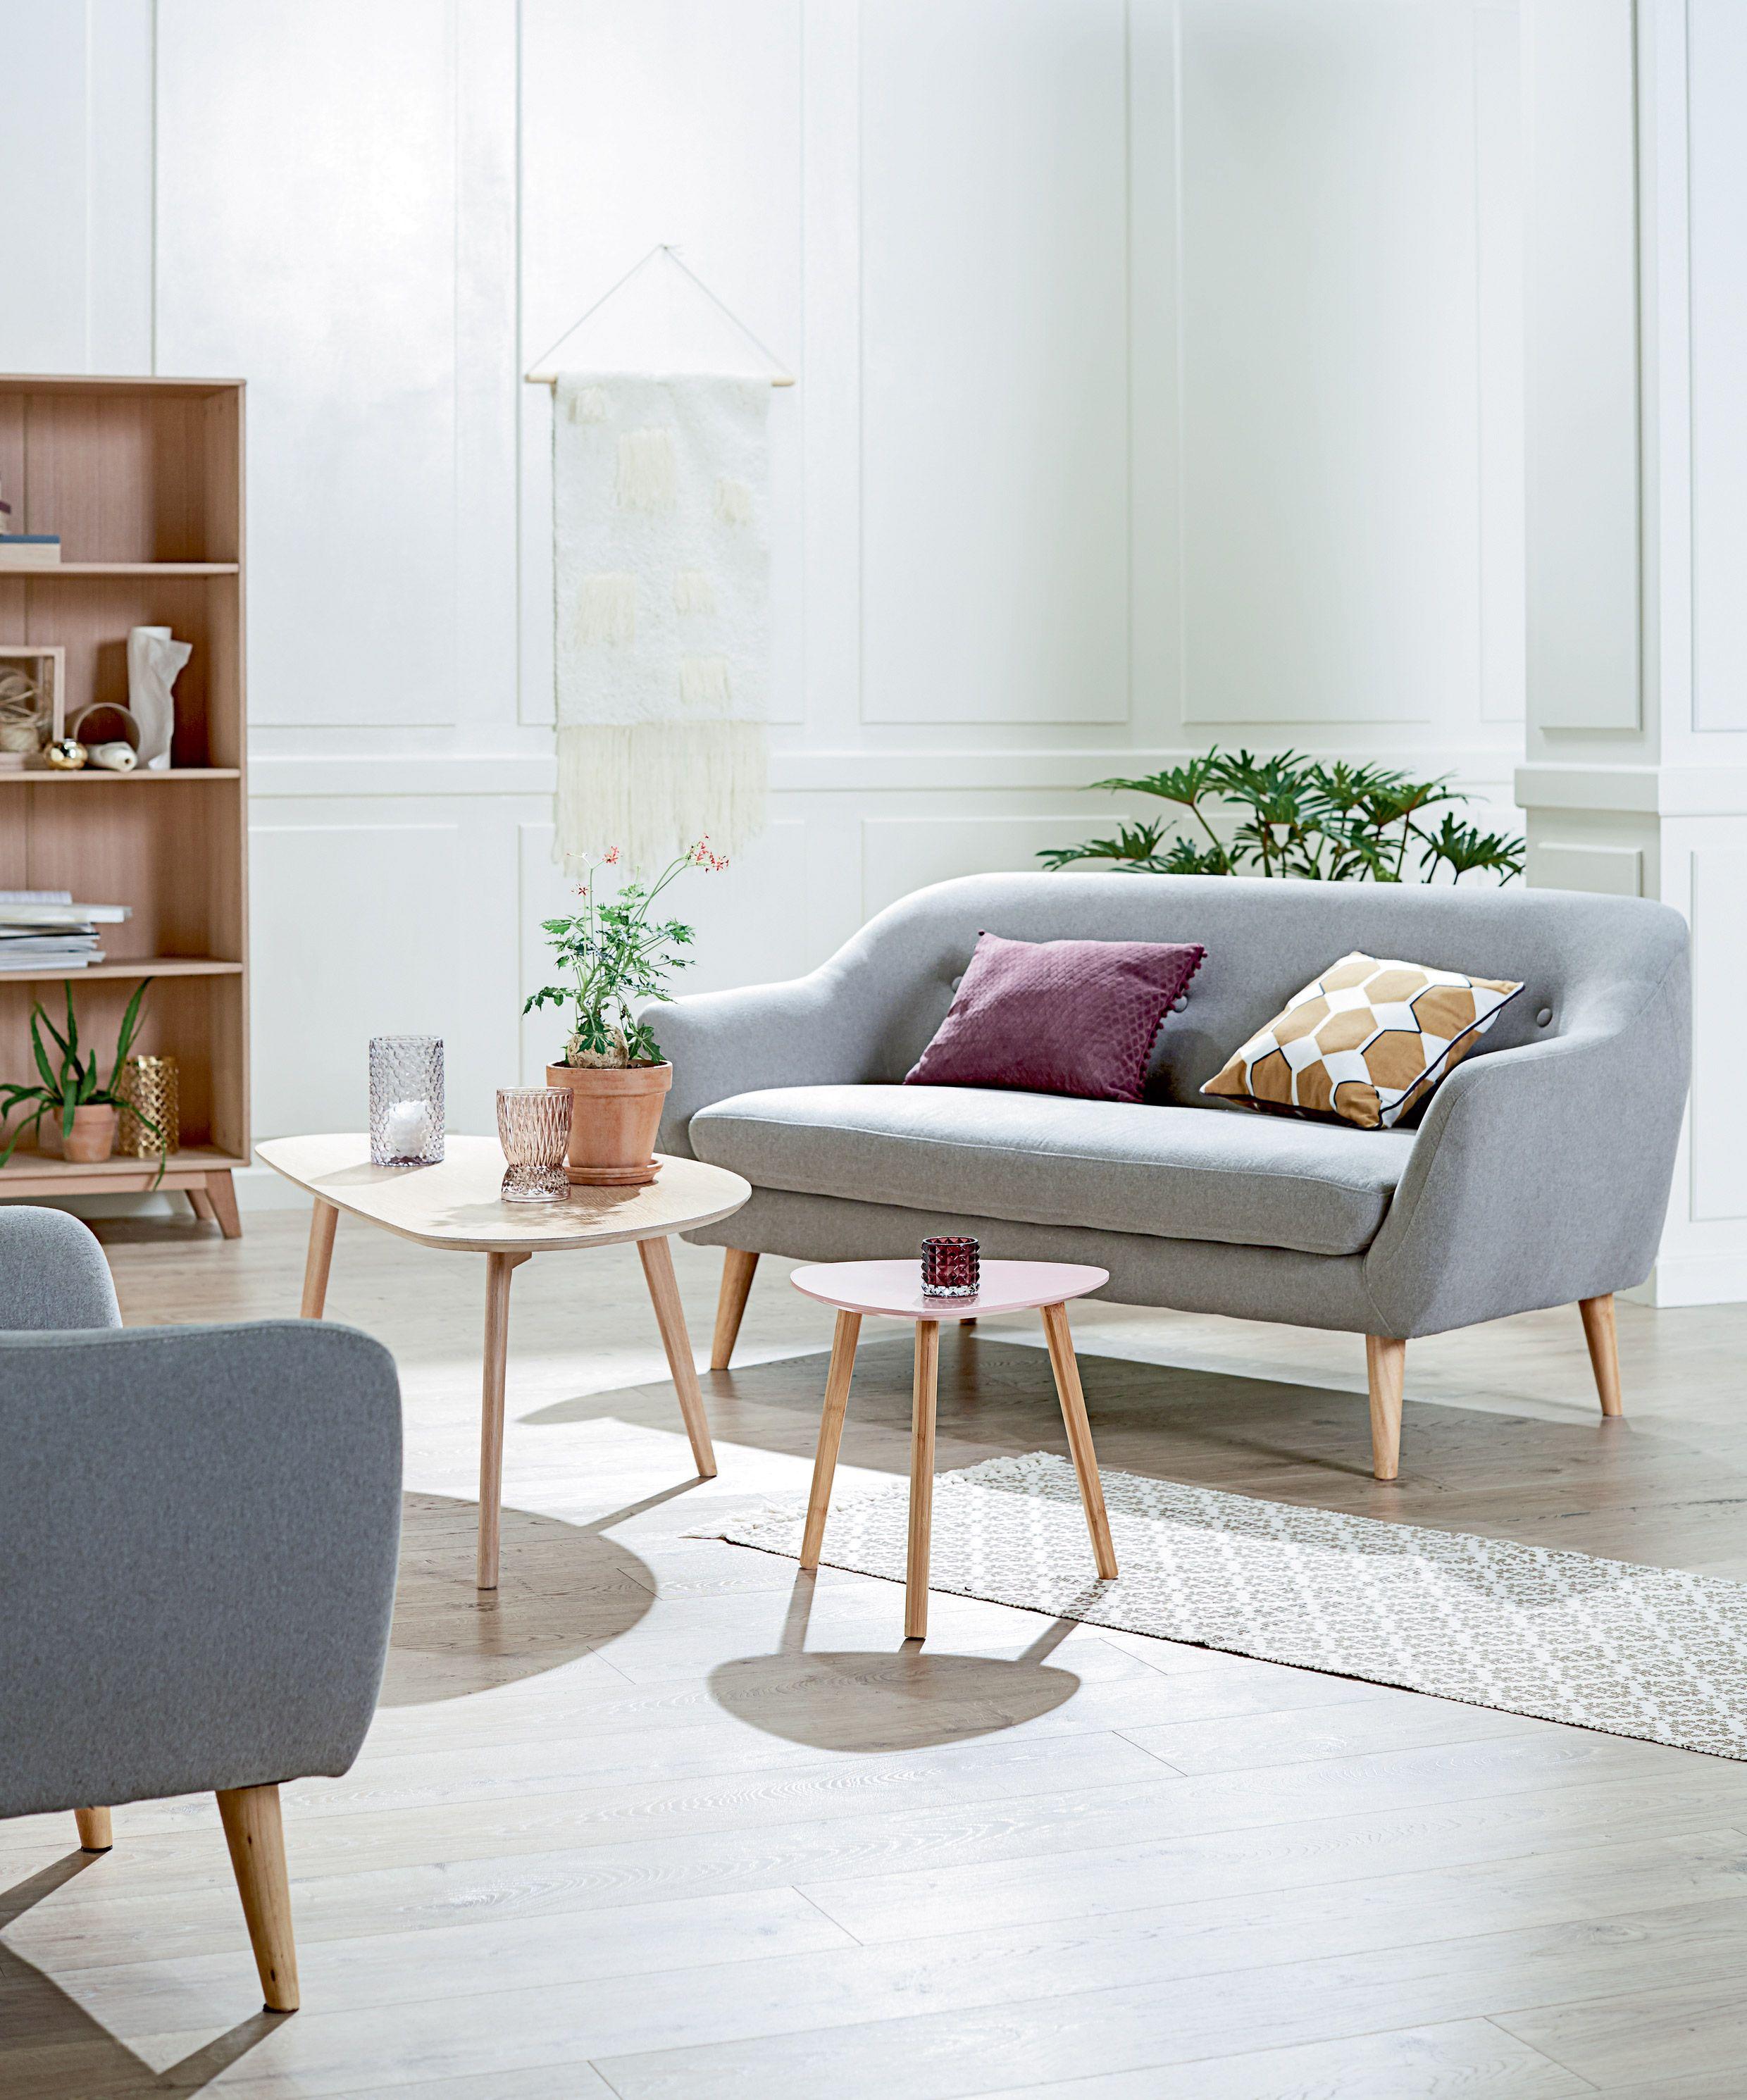 EGEDAL Sofa Lenestol TAPS Hjrnebord LEJRE